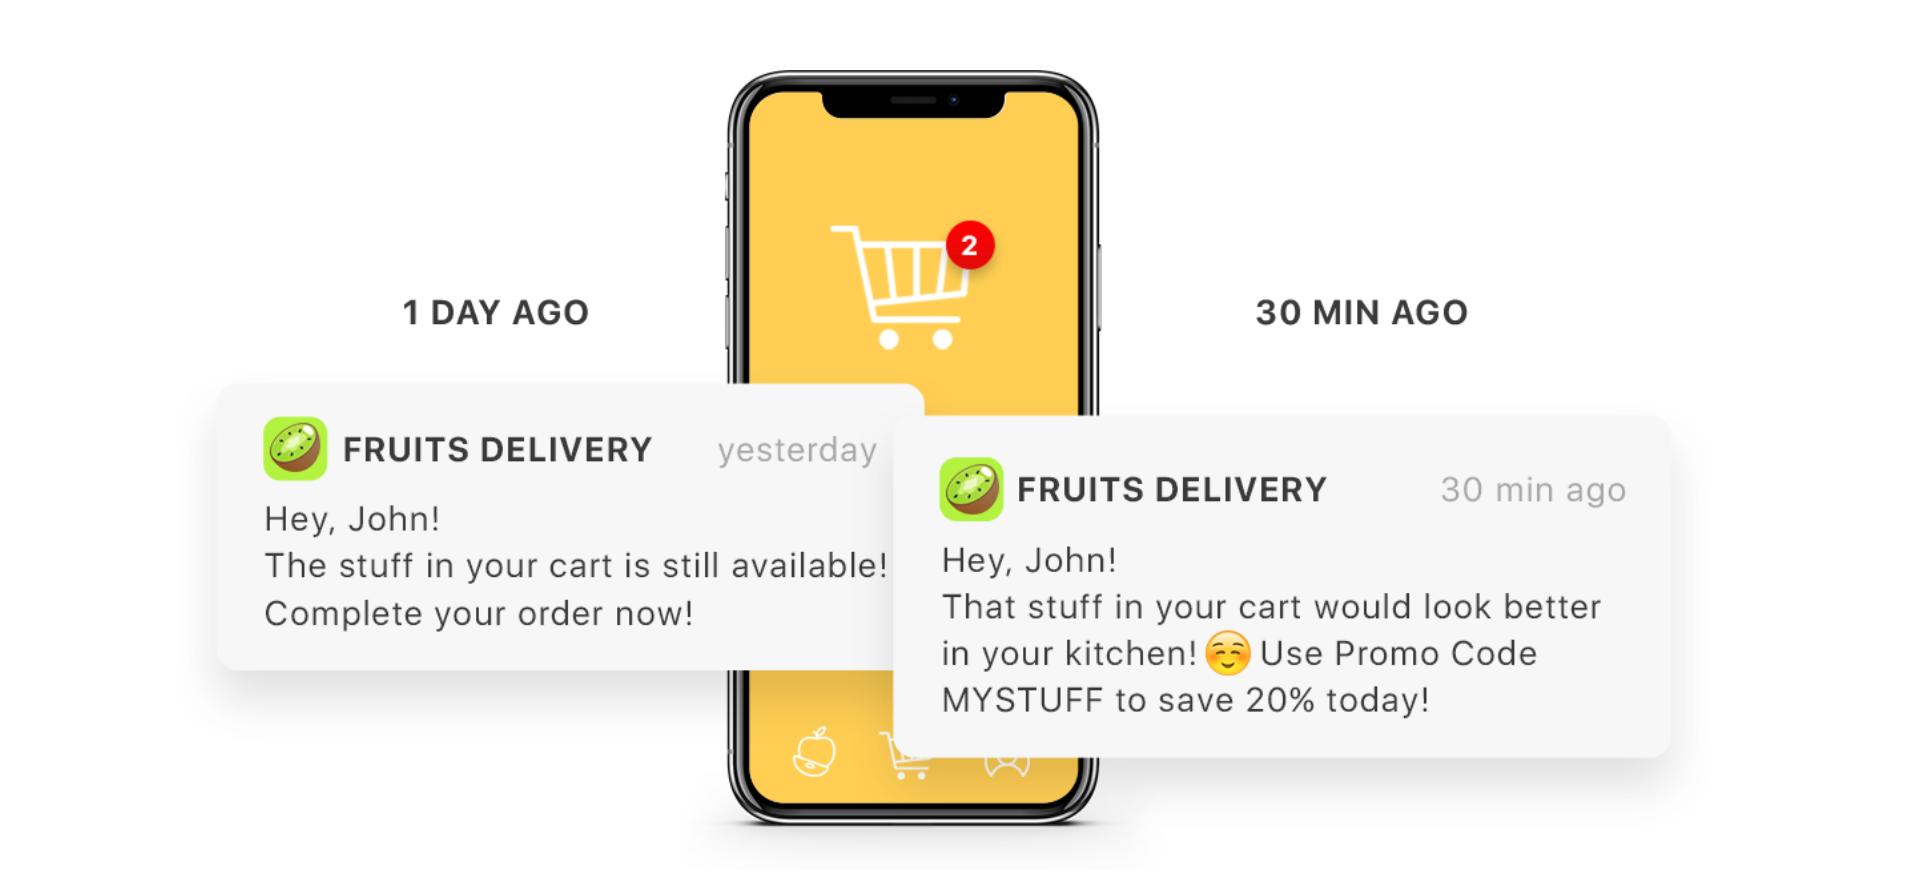 Behavior-based marketing push notifications - examples